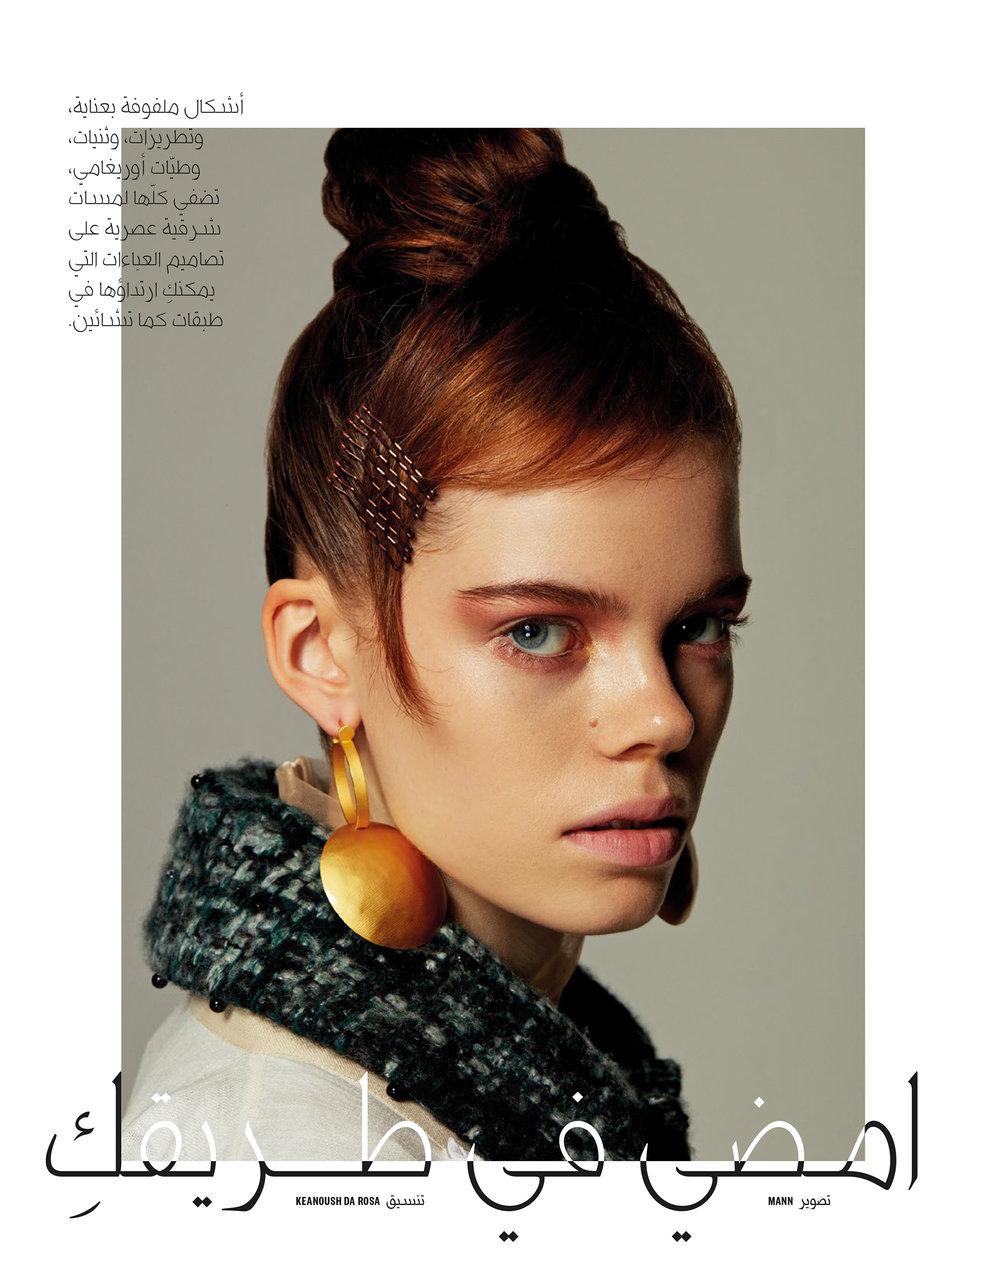 Vogue October Binder_Magzter (dragged)-8.jpg